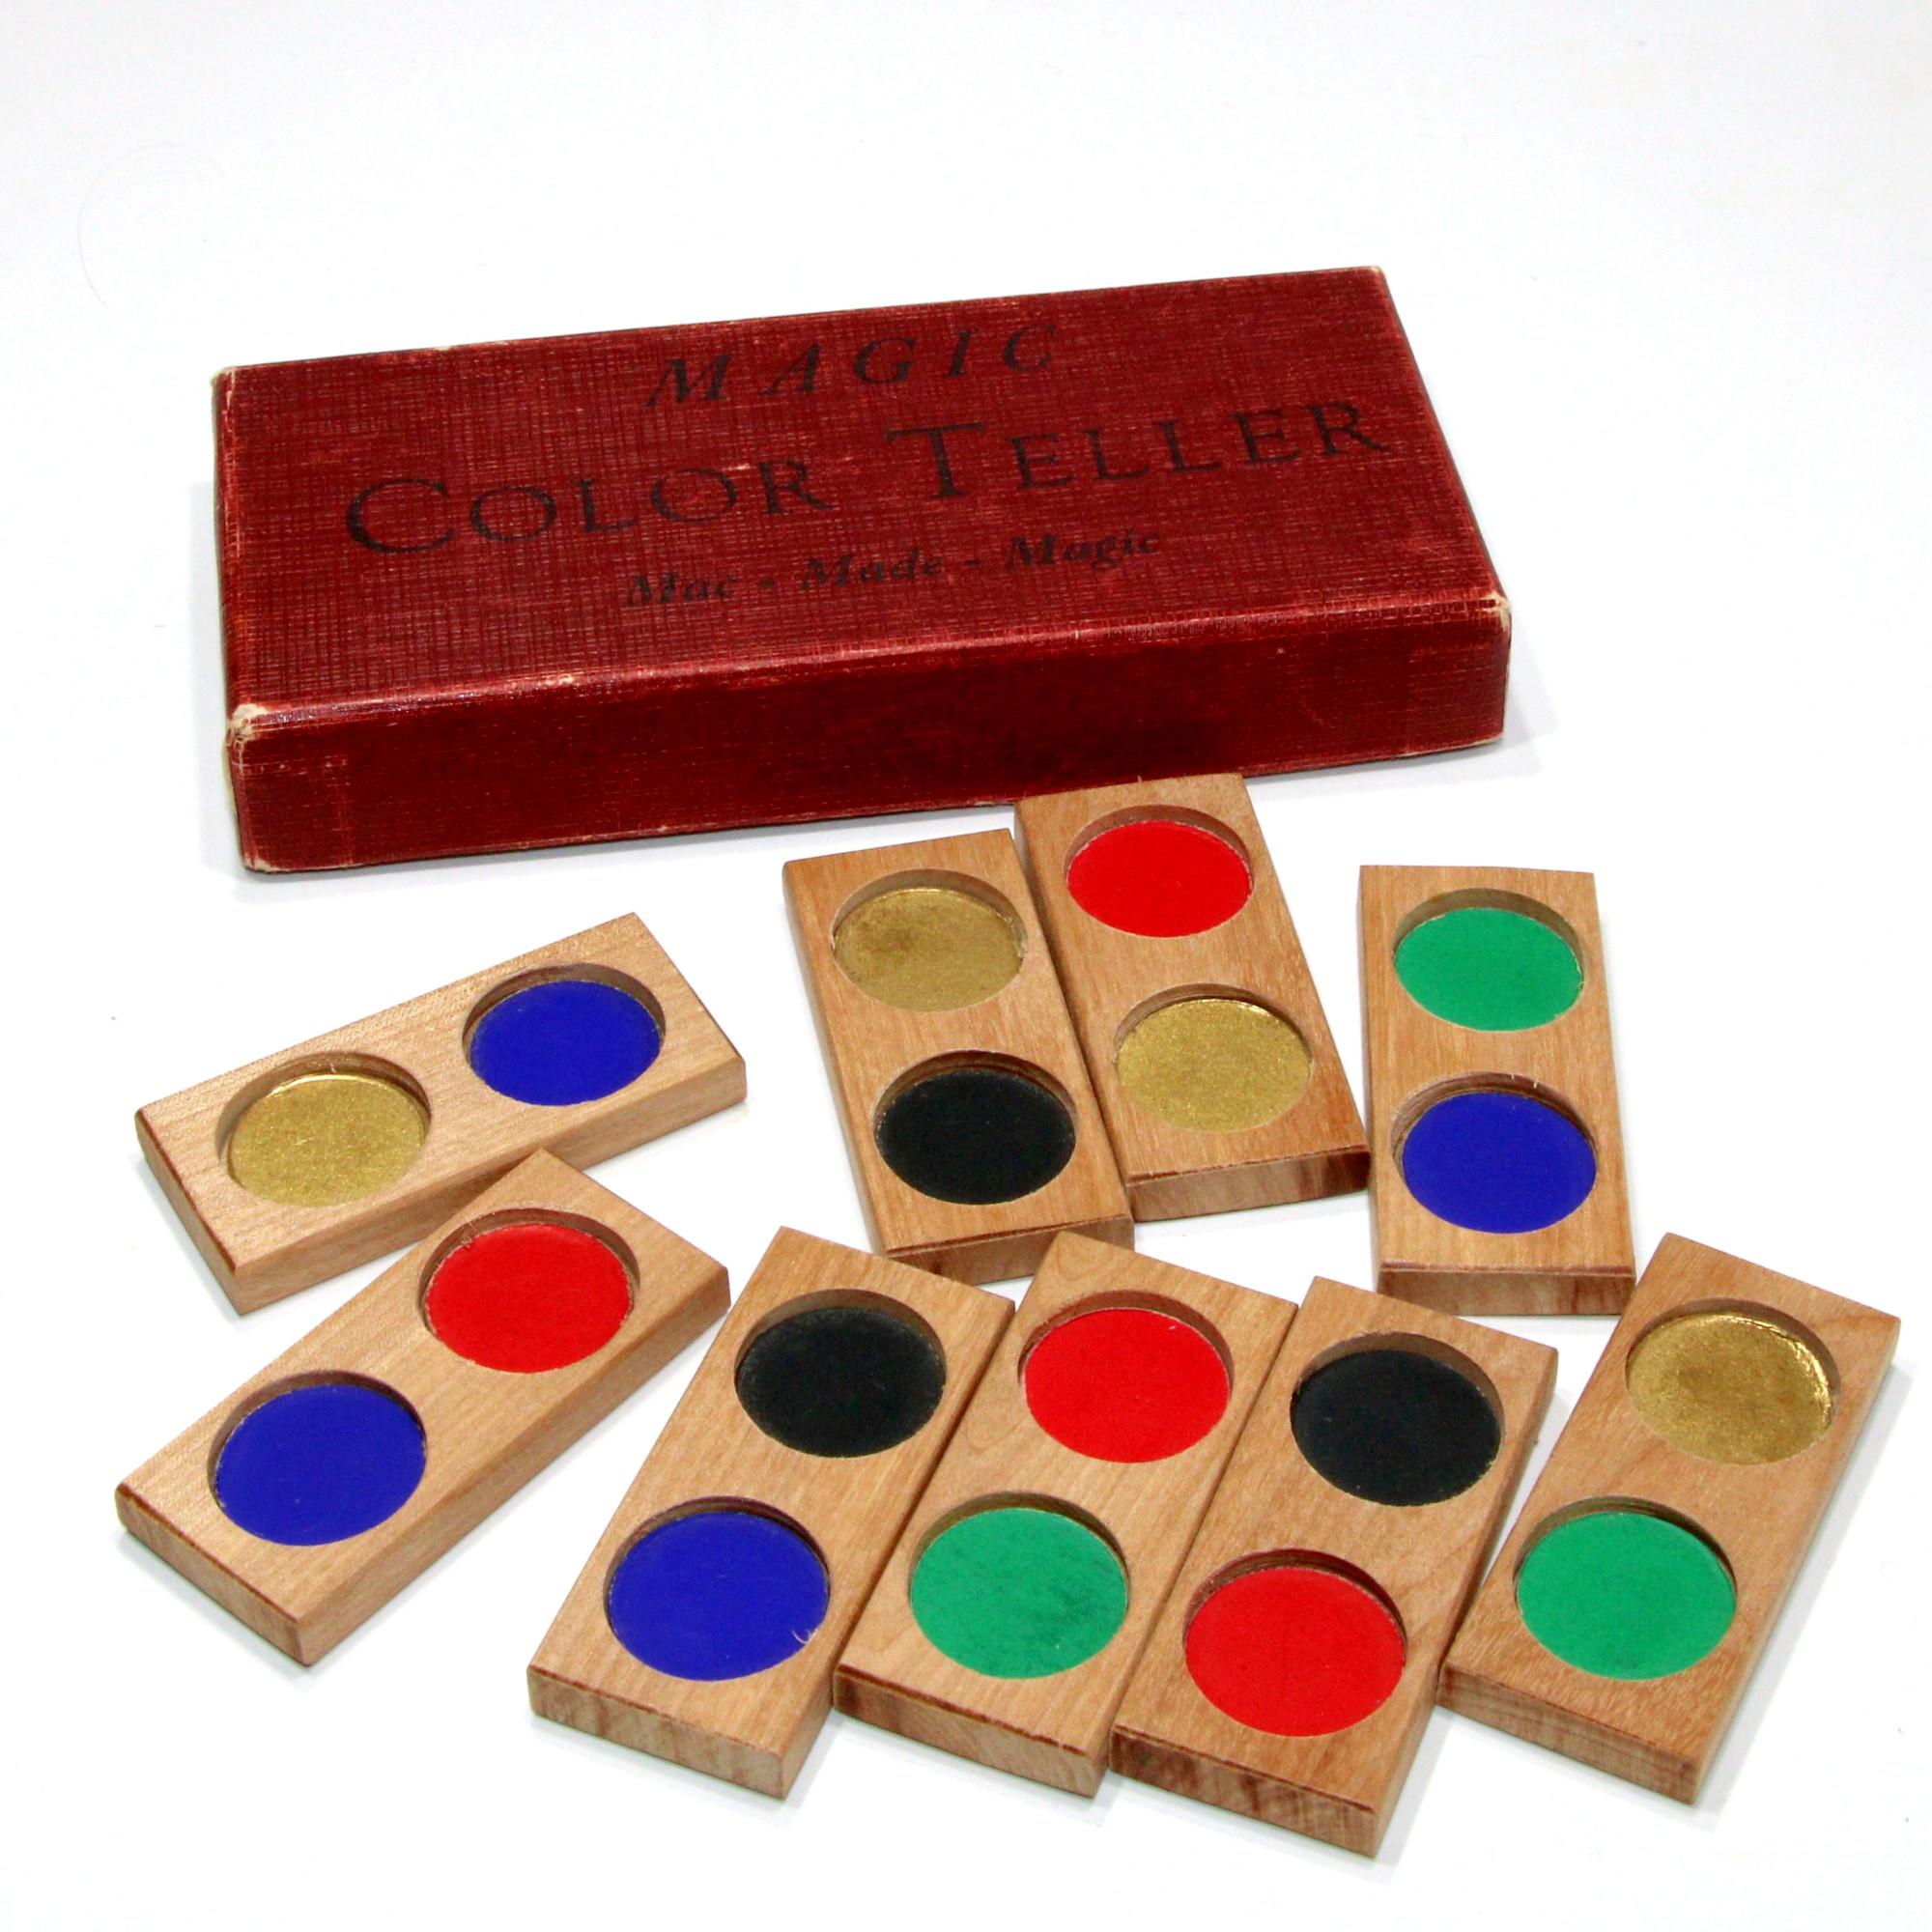 Magic Color Teller by Mac Made Magic